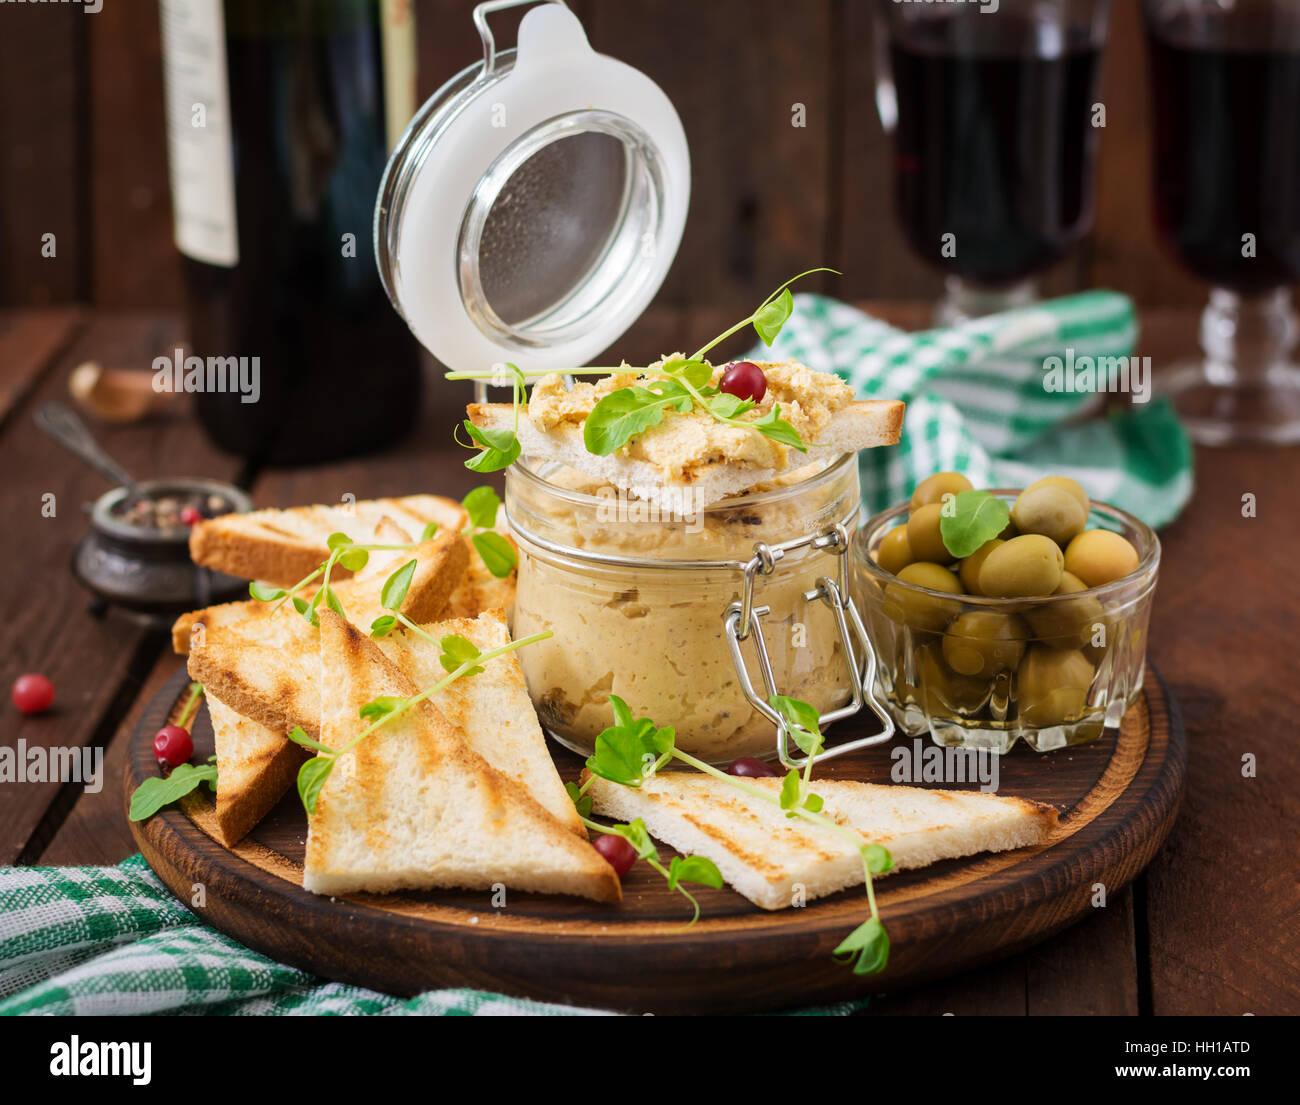 Pastete Huhn - Rillette, Toast, Oliven und Kräutern auf einem Holzbrett Stockbild